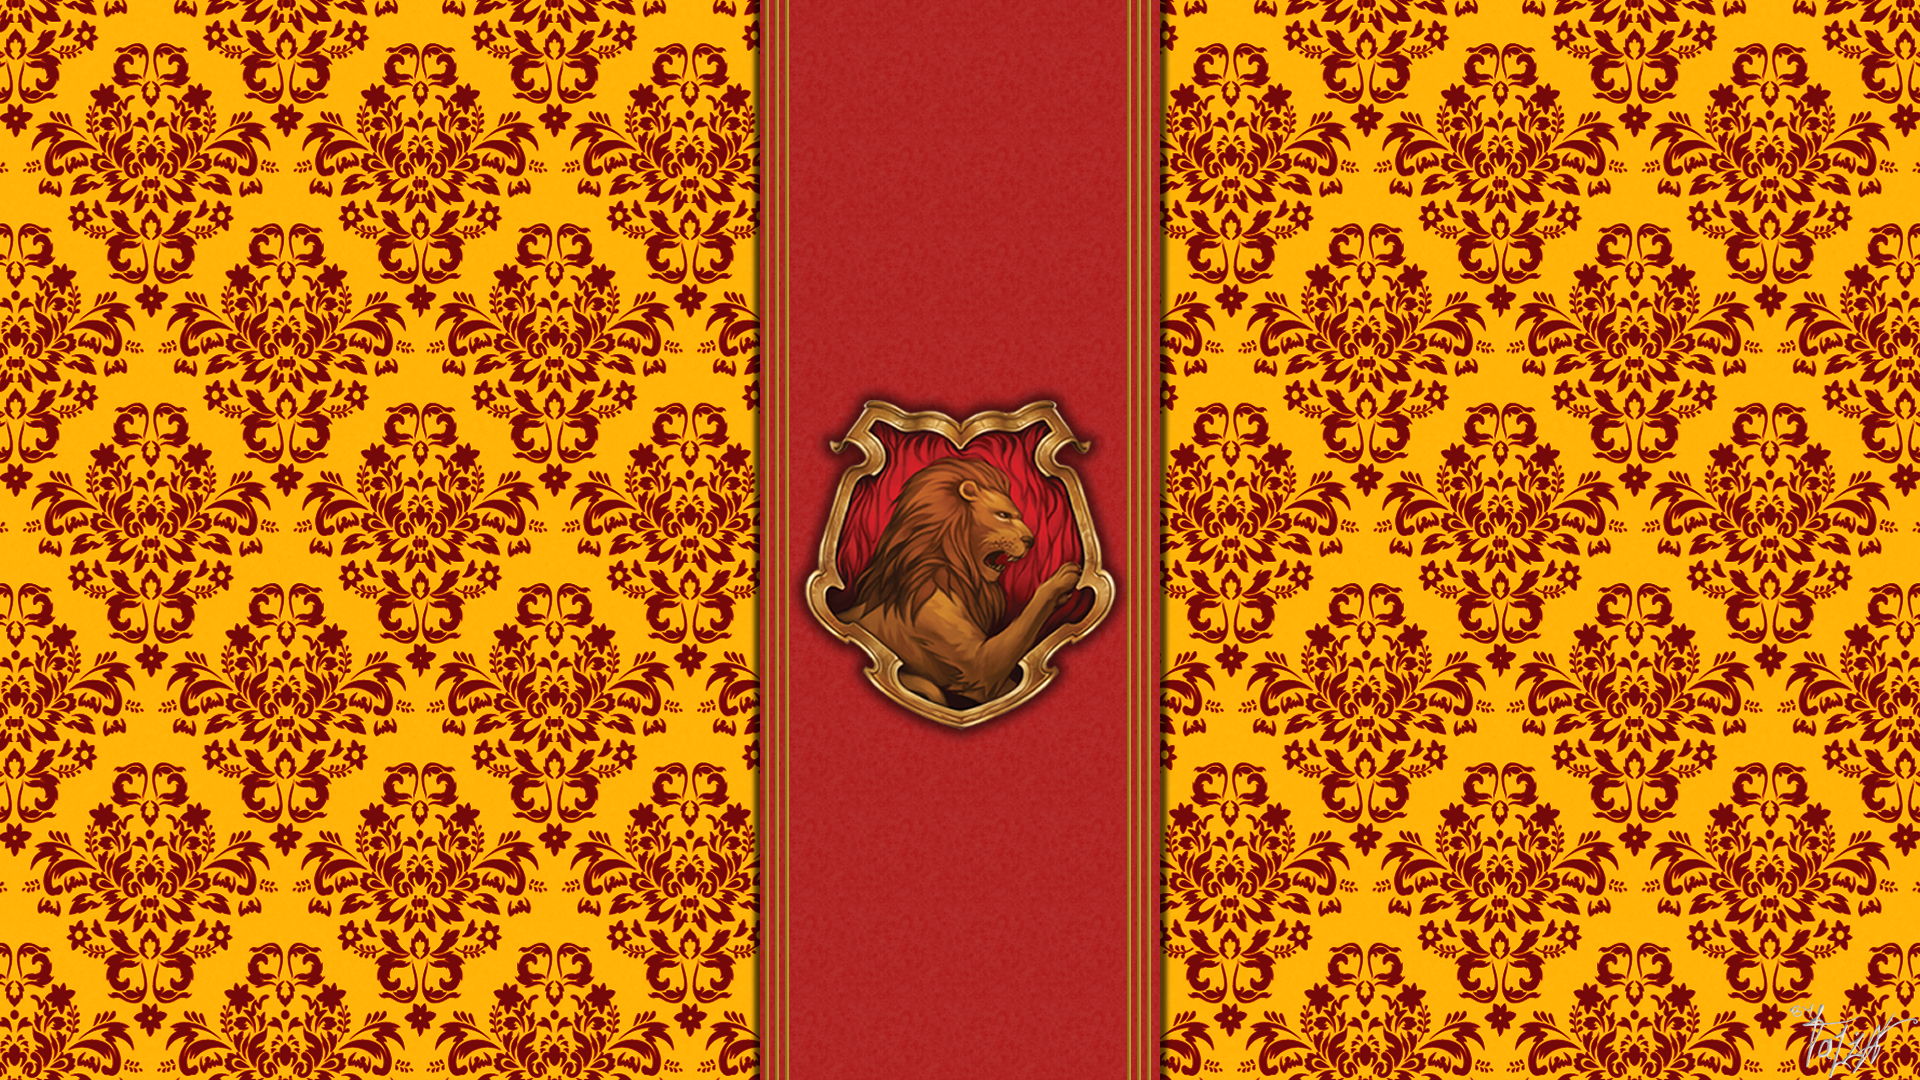 hogwarts house wallpaper   gryffindor by theladyavatar d4ol8mtjpg 1920x1080